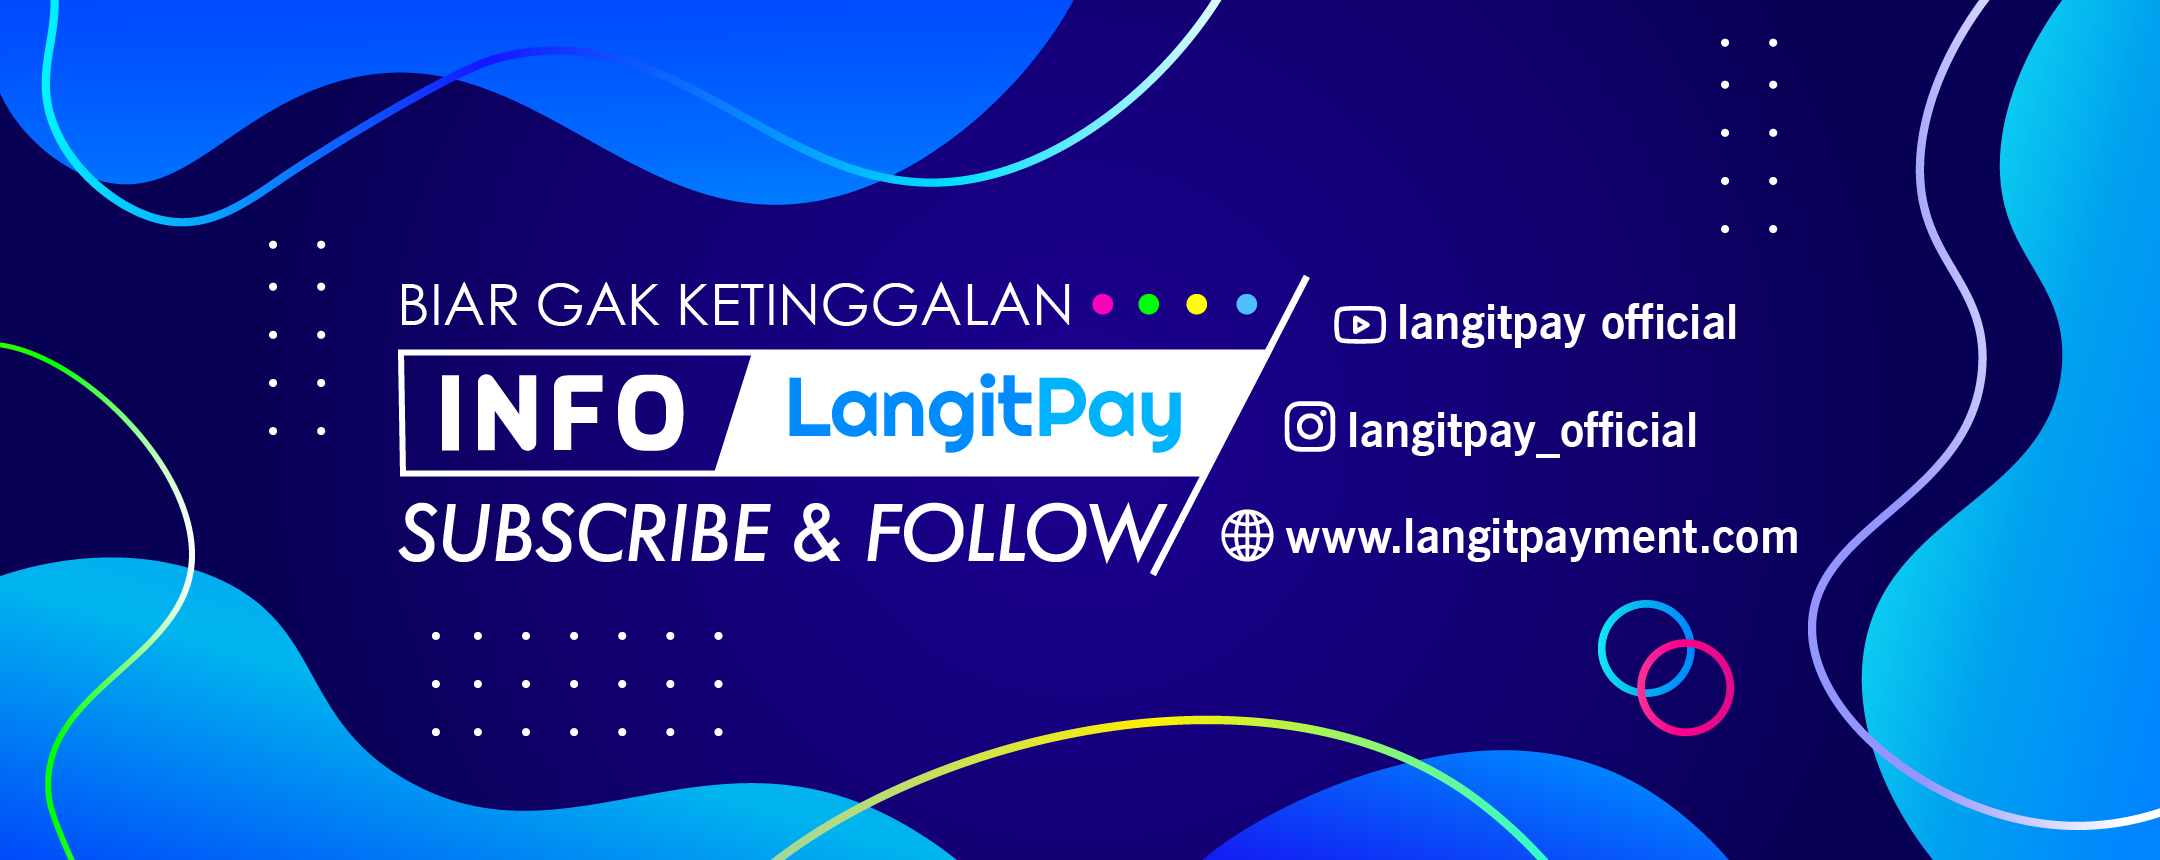 Promo LangitPay